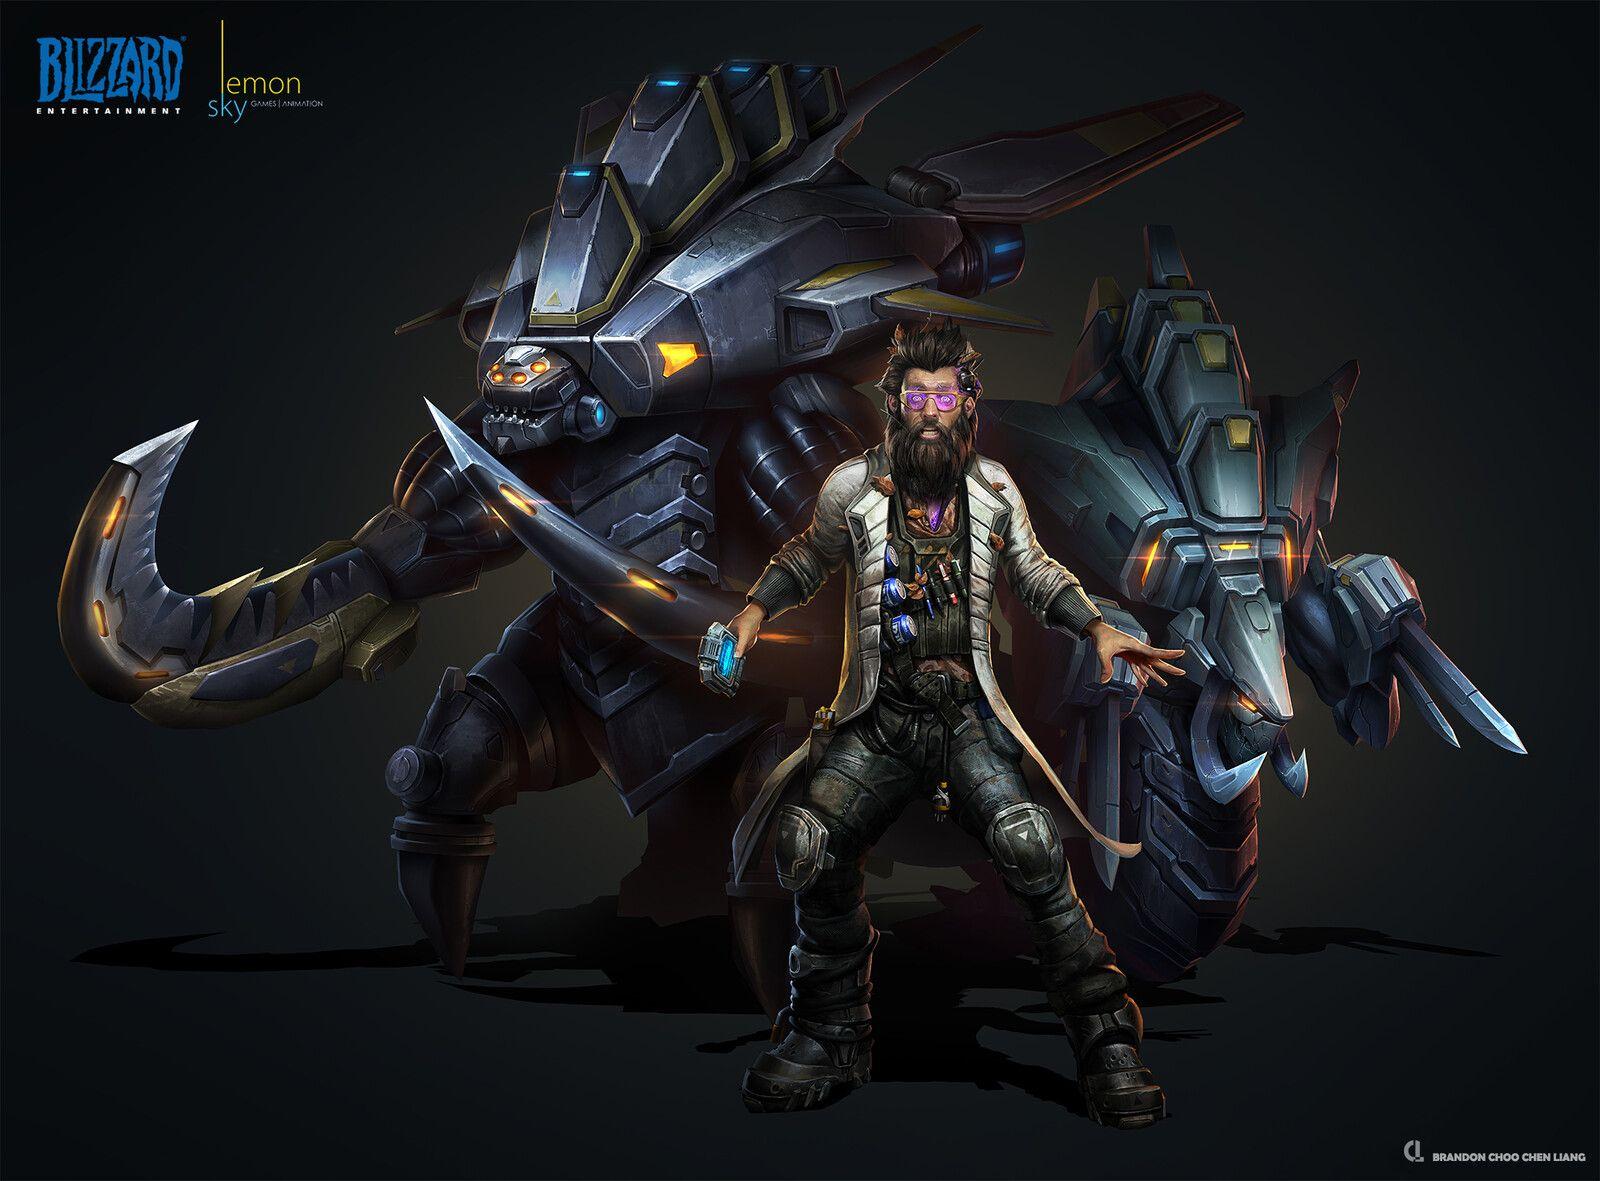 ArtStation - StarCraft II Co-op Commander: Stetmann, Brandon Choo Chen  Liang in 2020   Starcraft, Cdr, Artwork